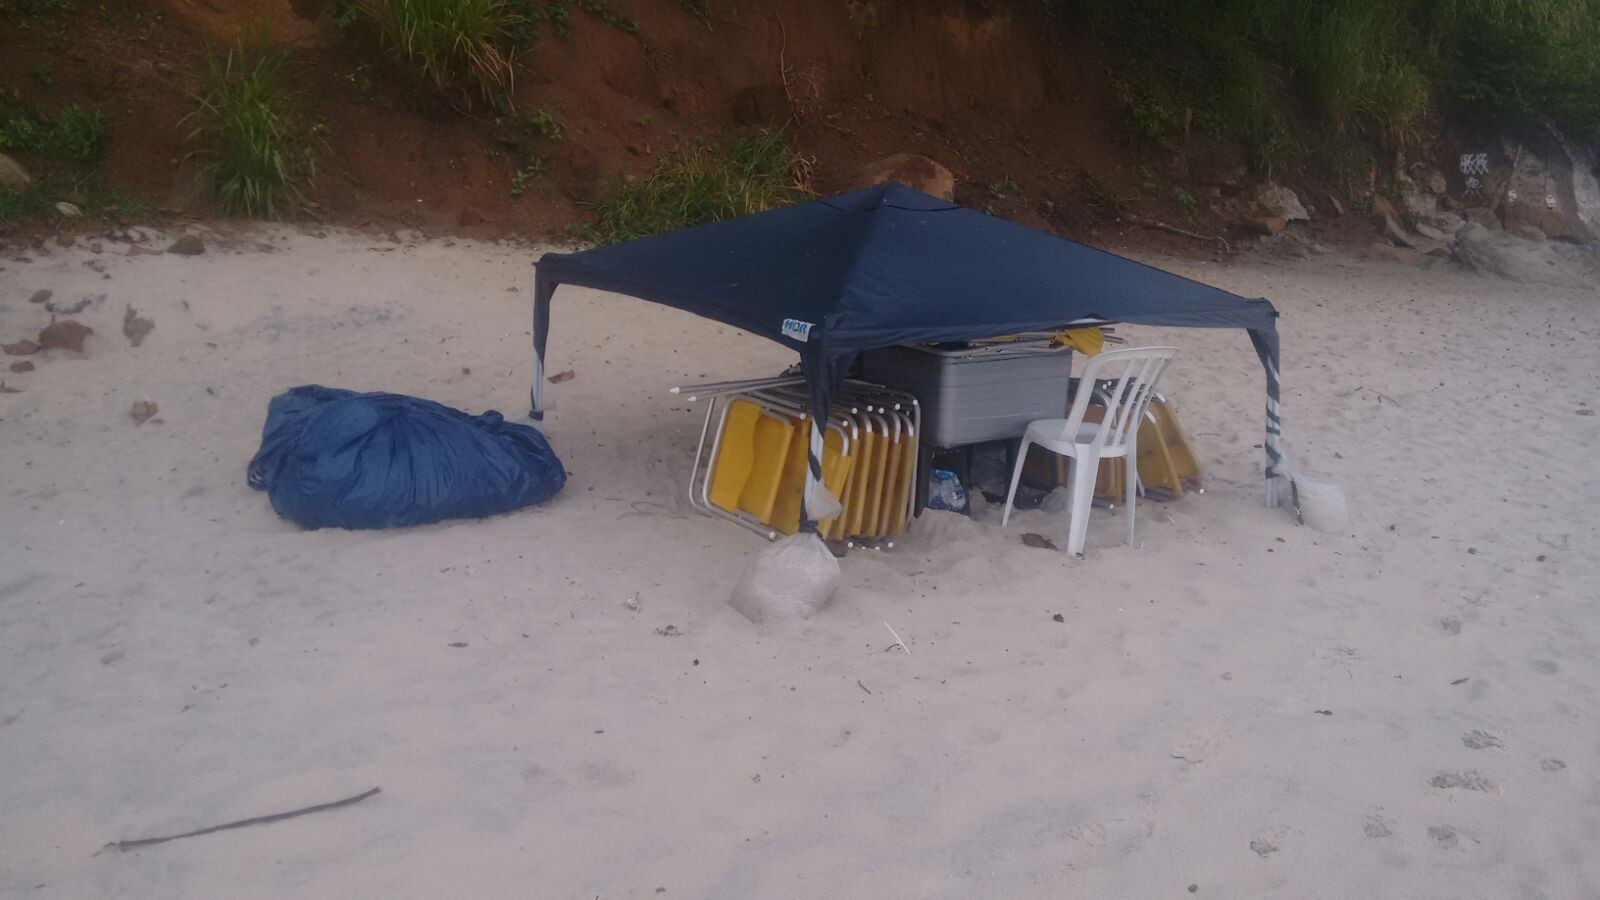 Guarda Municipal apreende material irregular na Praia de Abricó